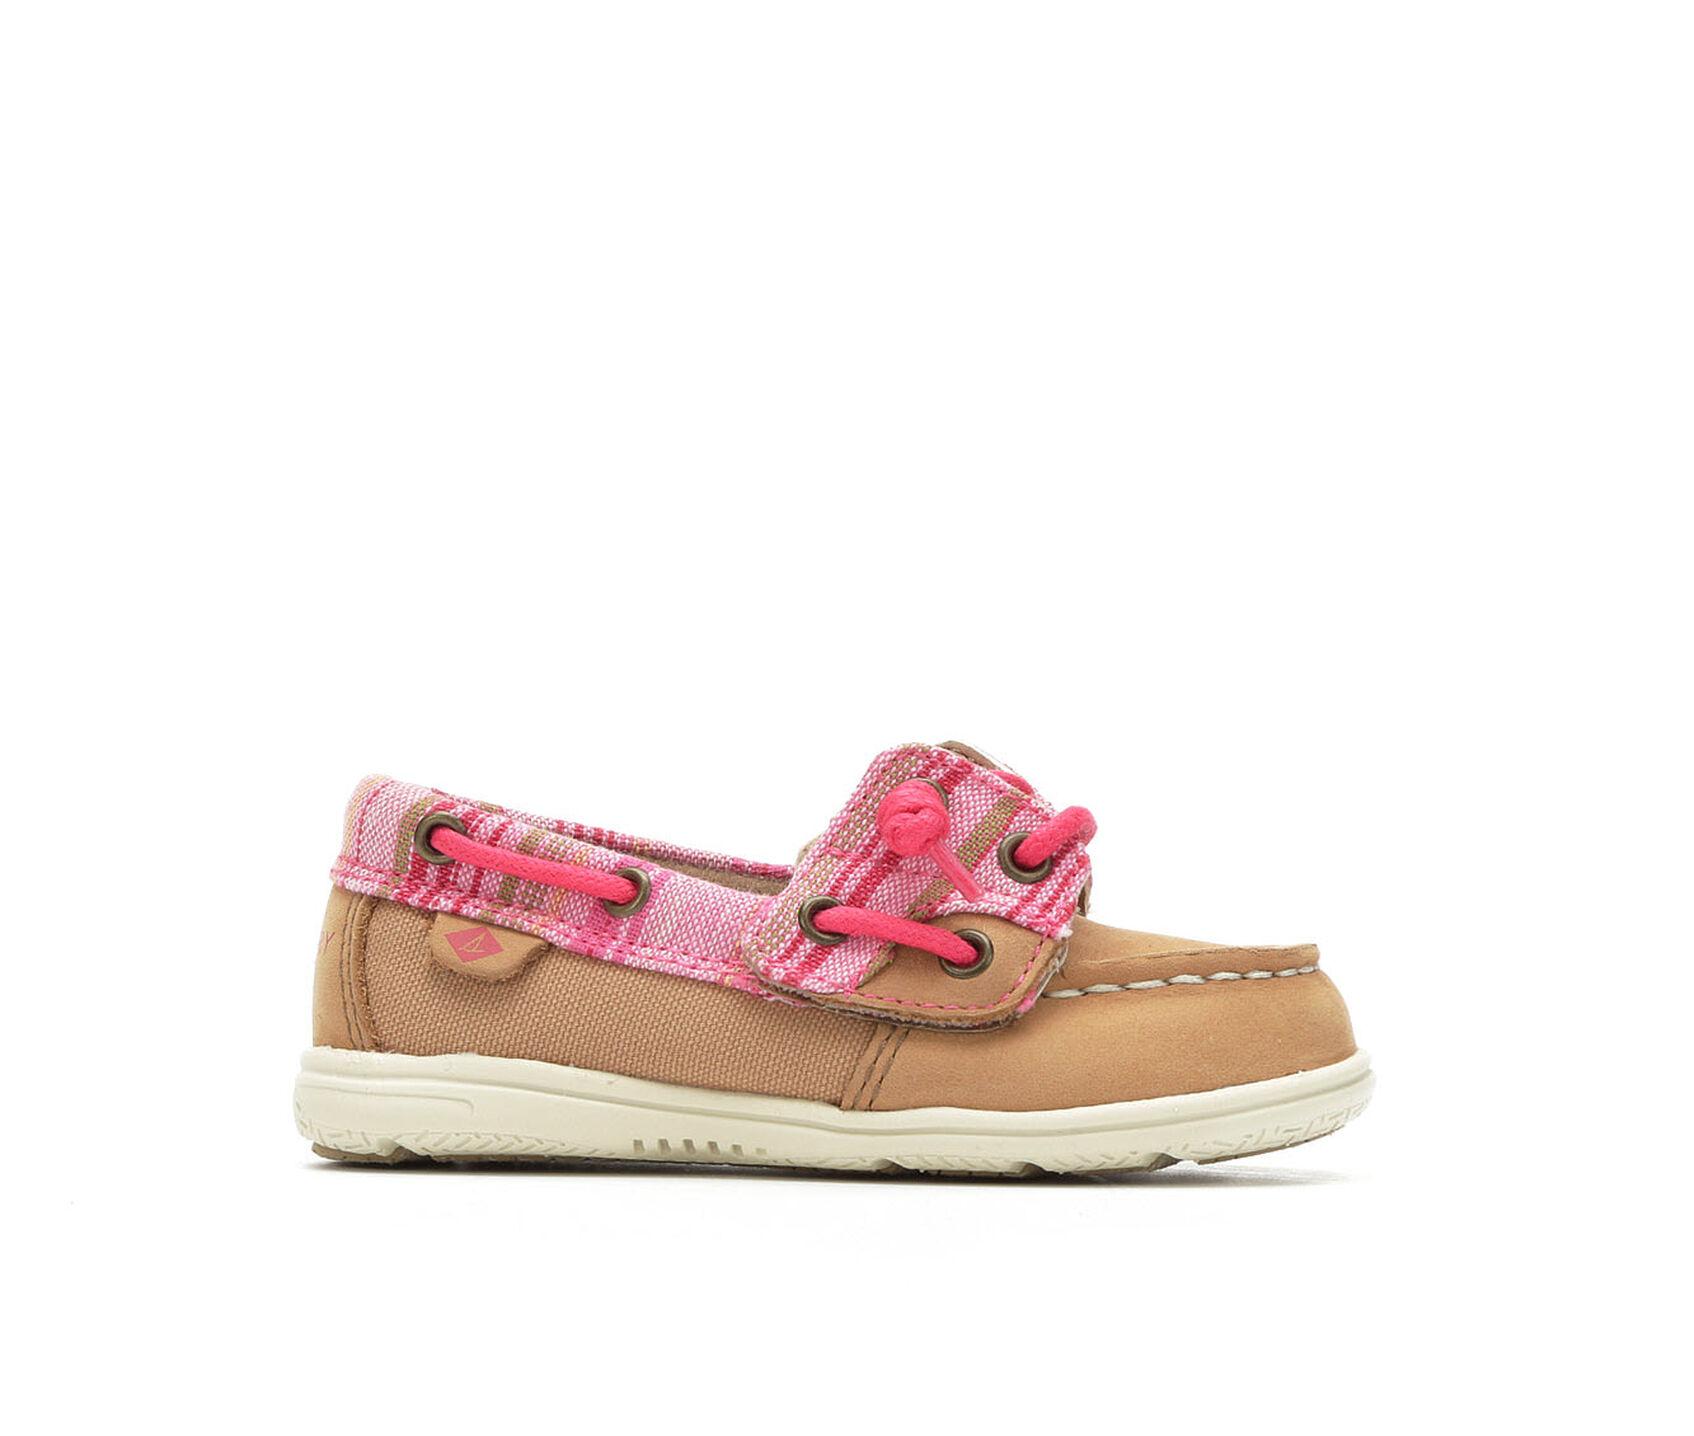 Girls Sperry Infant Shoresider 5 12 Boat Shoes